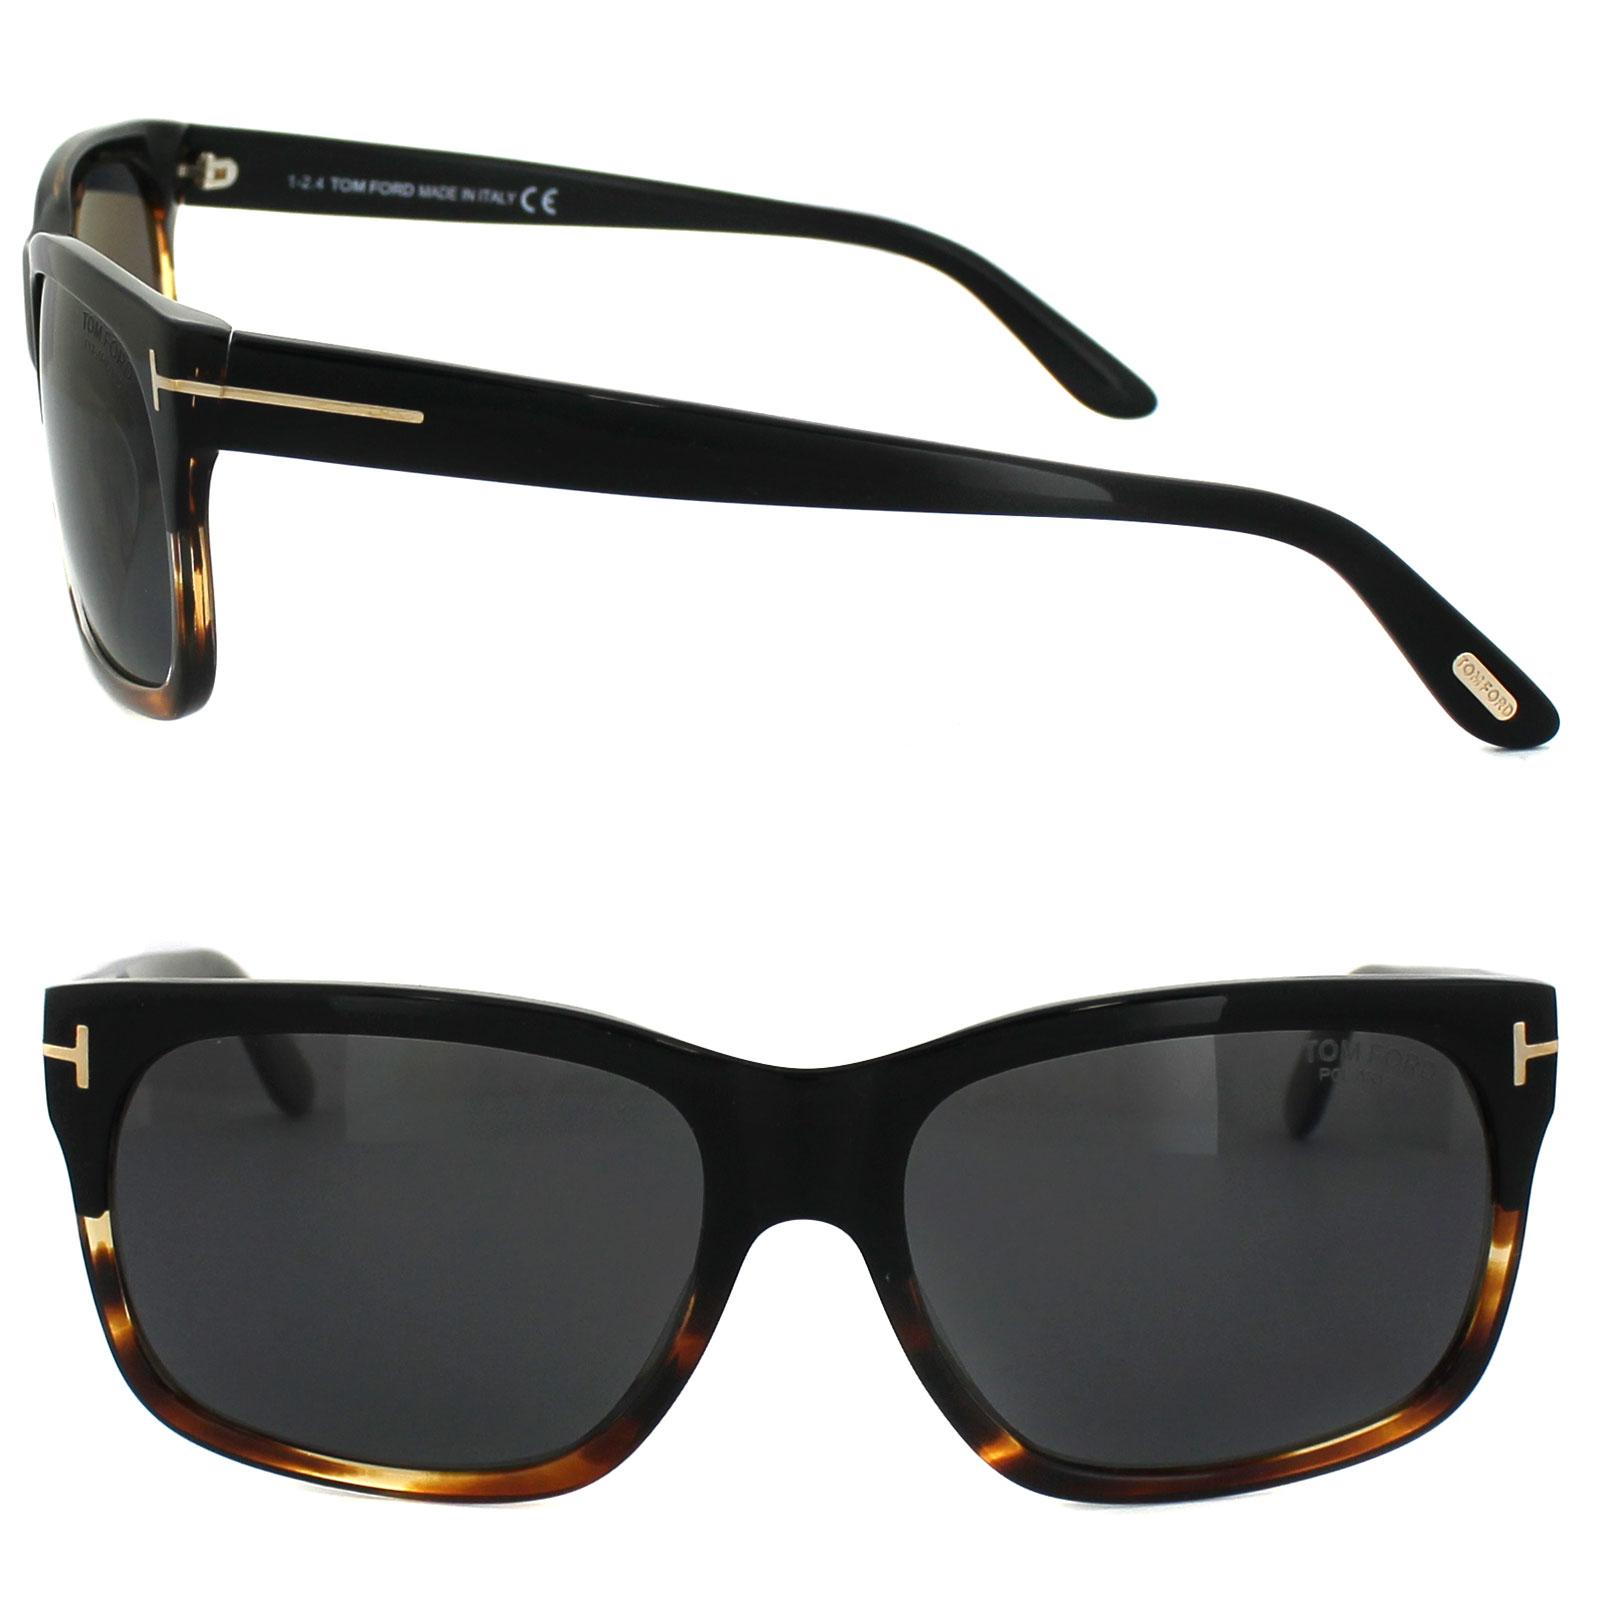 e7a54133d6 Cheap Tom Ford 0376 Barbara Sunglasses - Discounted Sunglasses